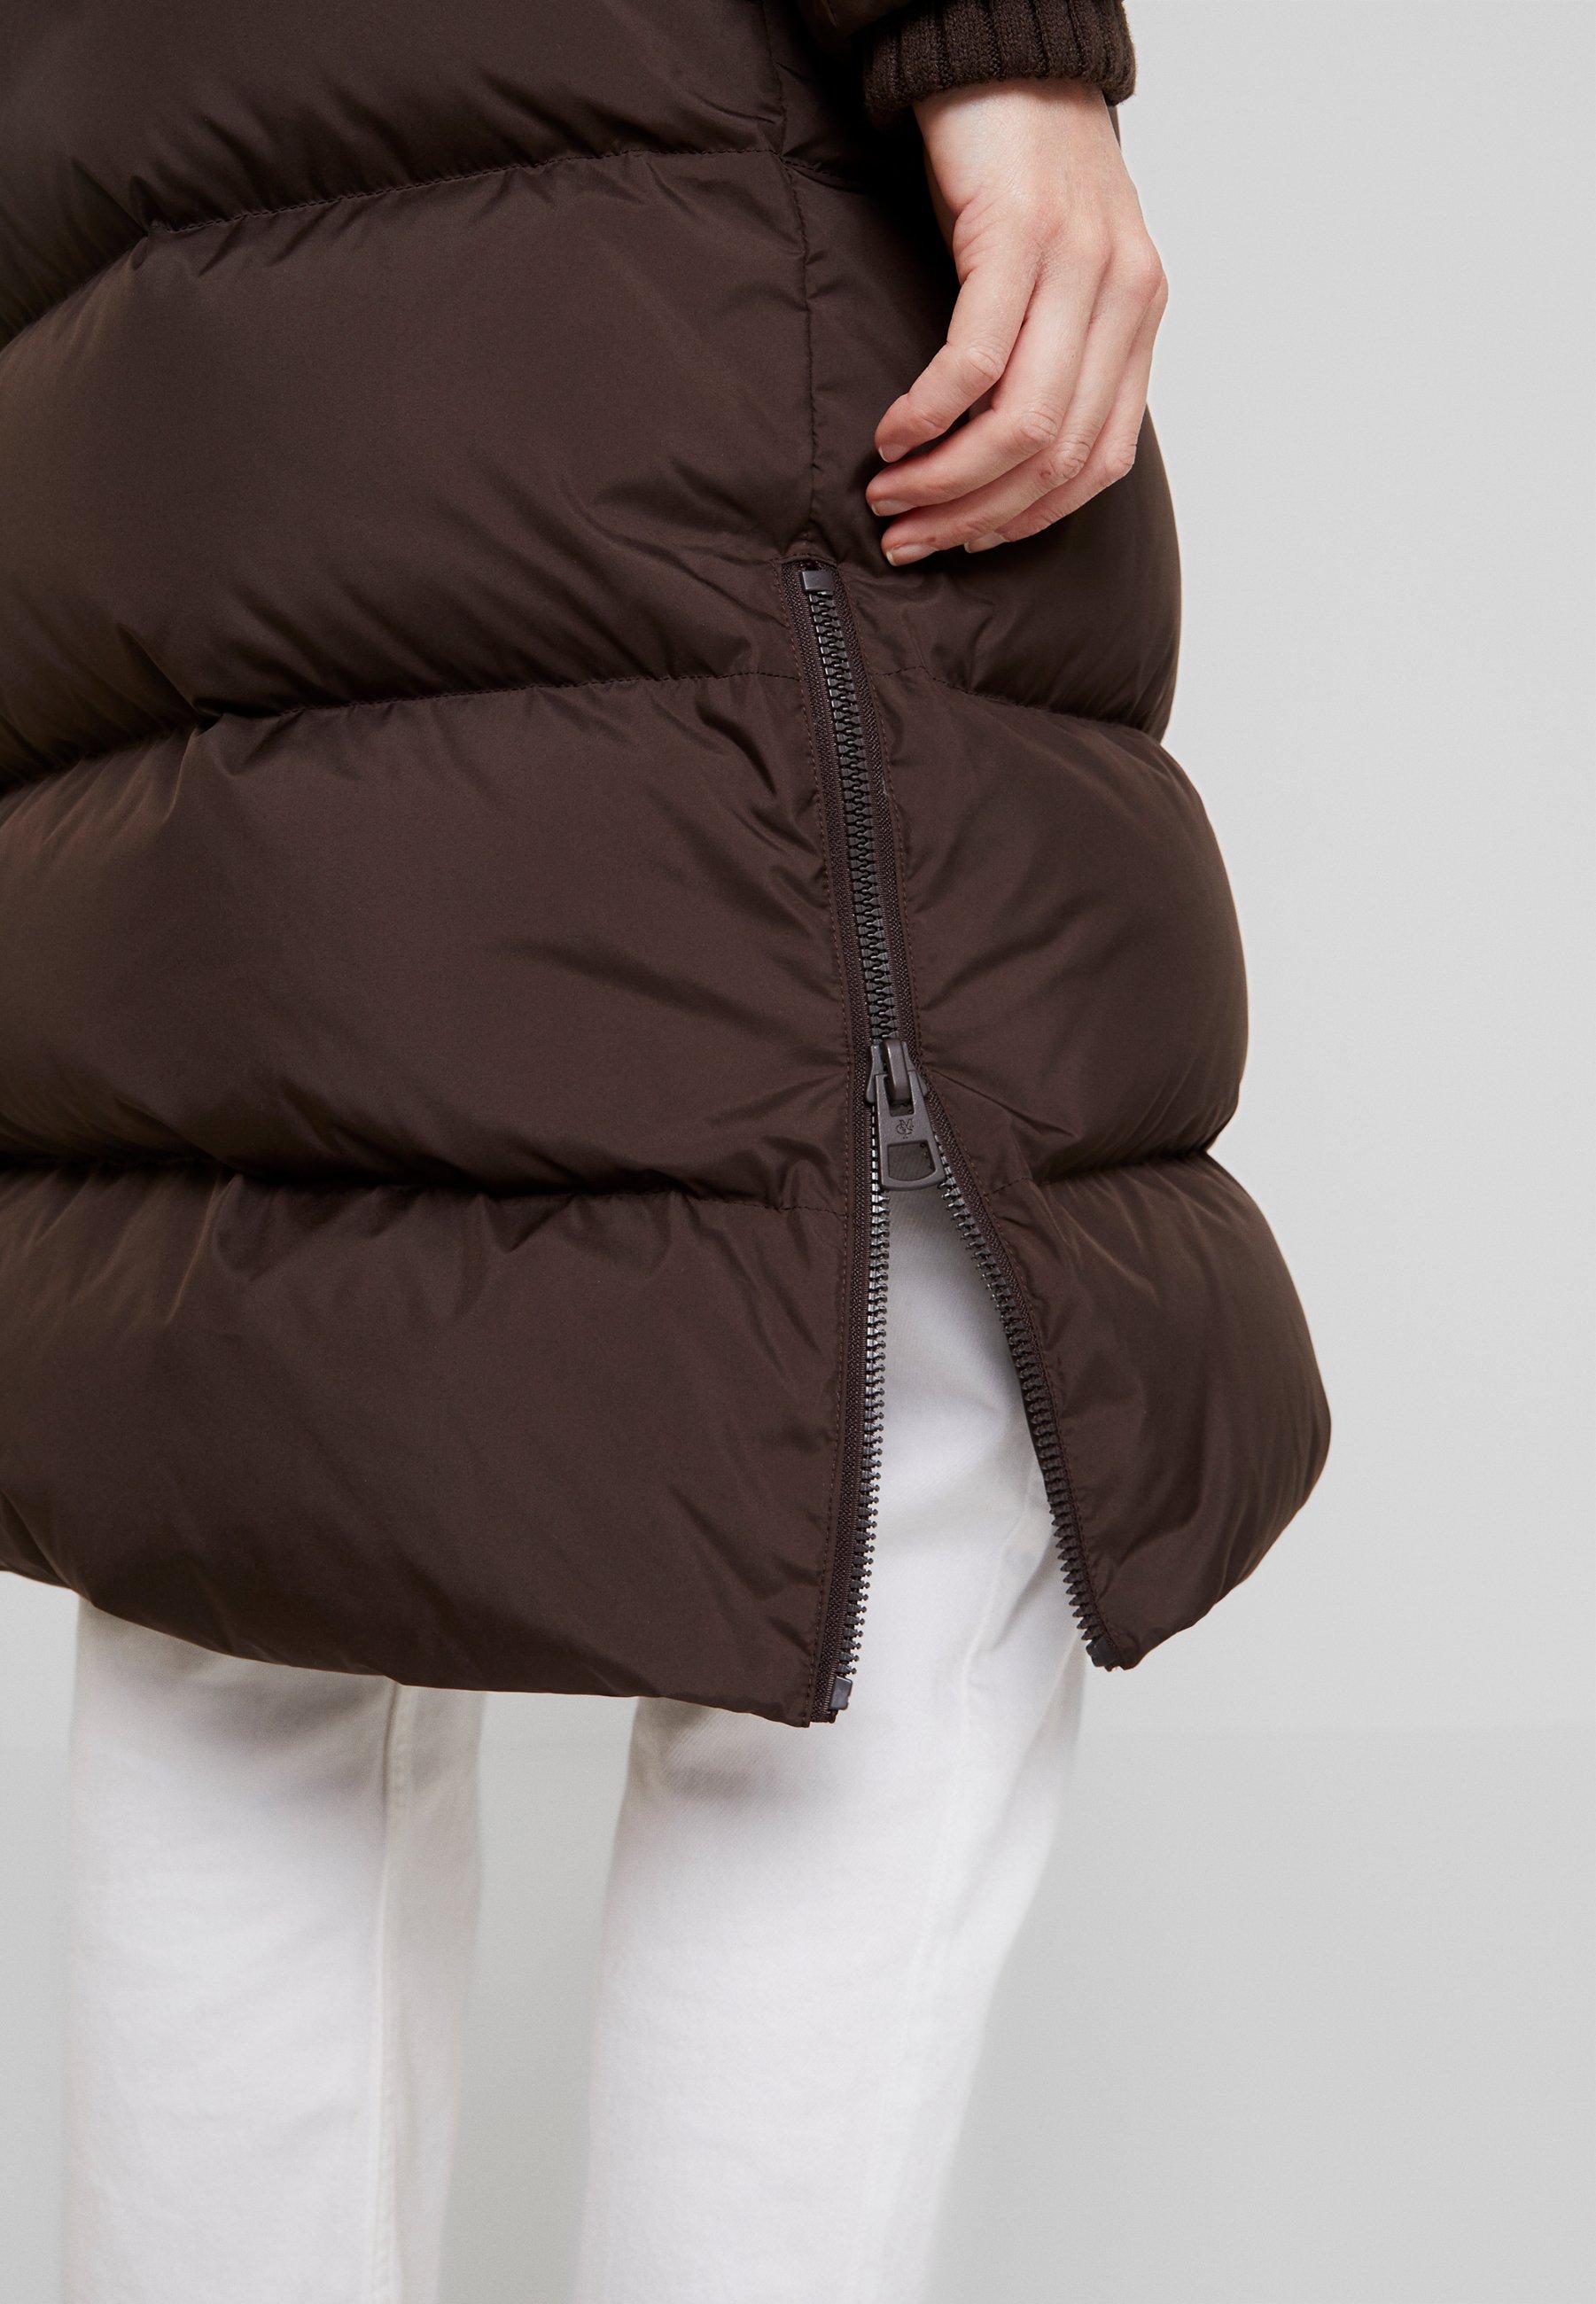 Marc O'polo Big Puffer Coat Hood Welt Pockets With Hidden Pressbutto - Dunkappa / -rock Coffee Bean